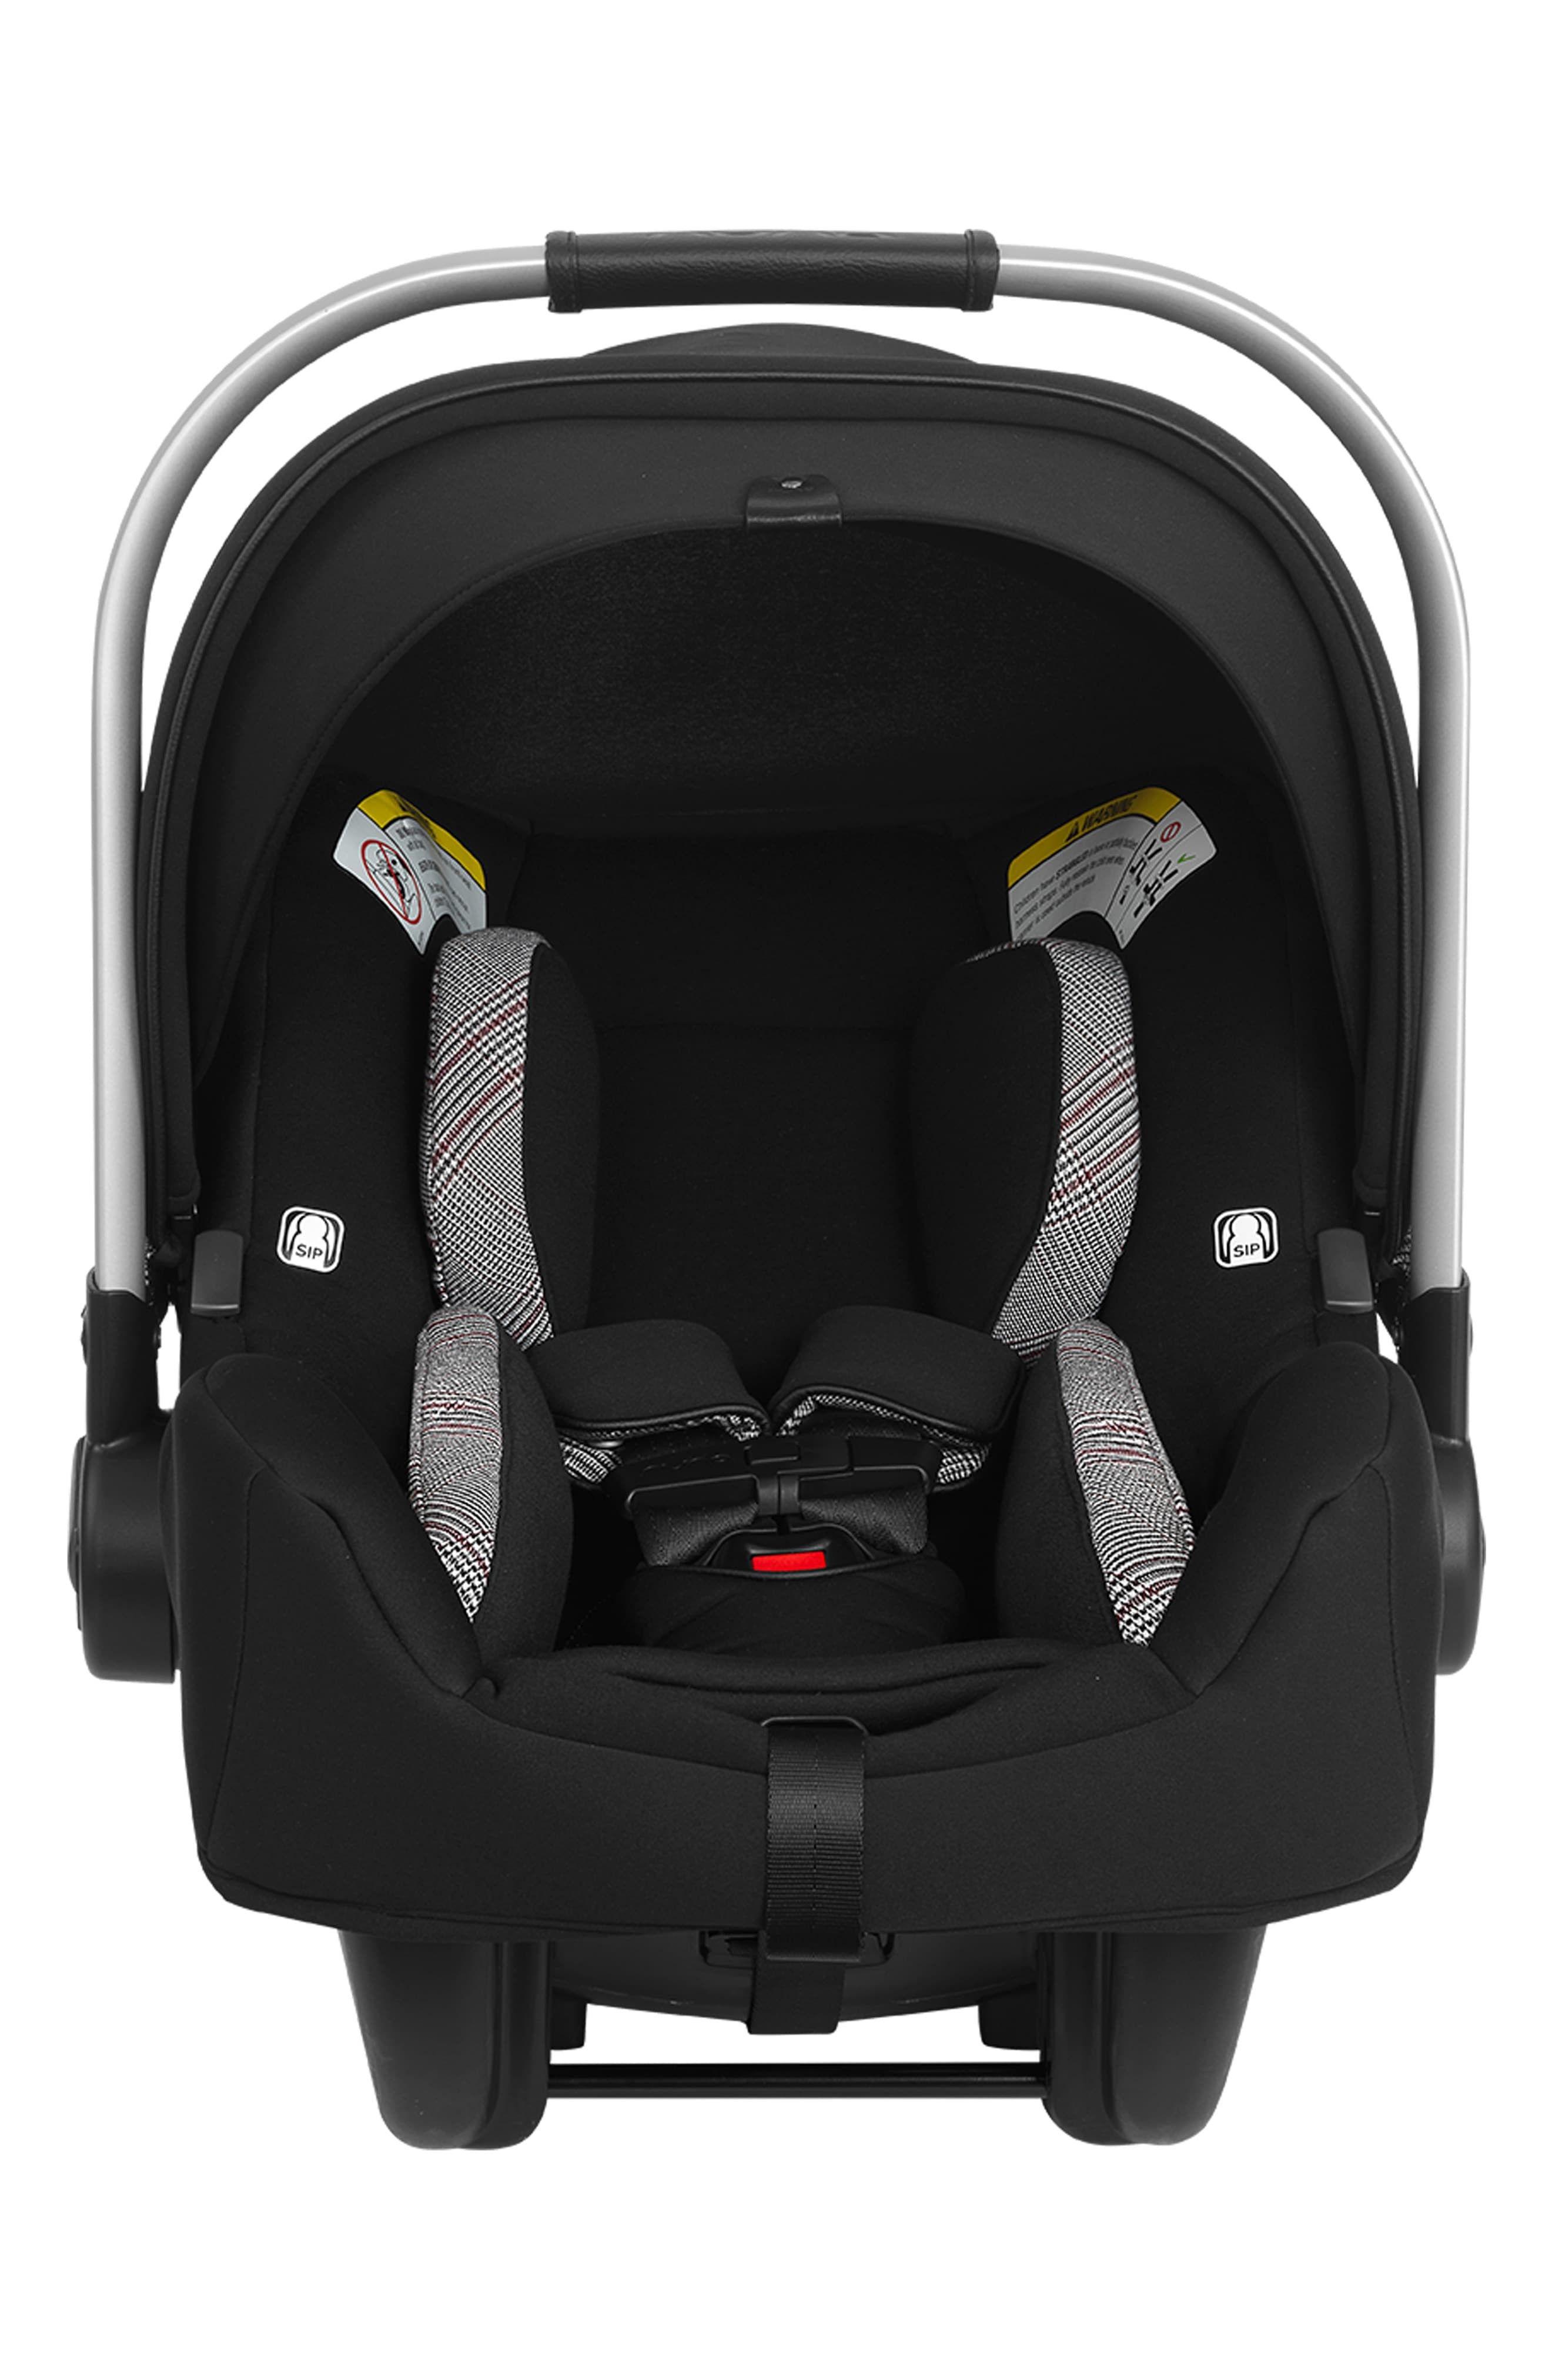 Pin on Baby Registry Essentials